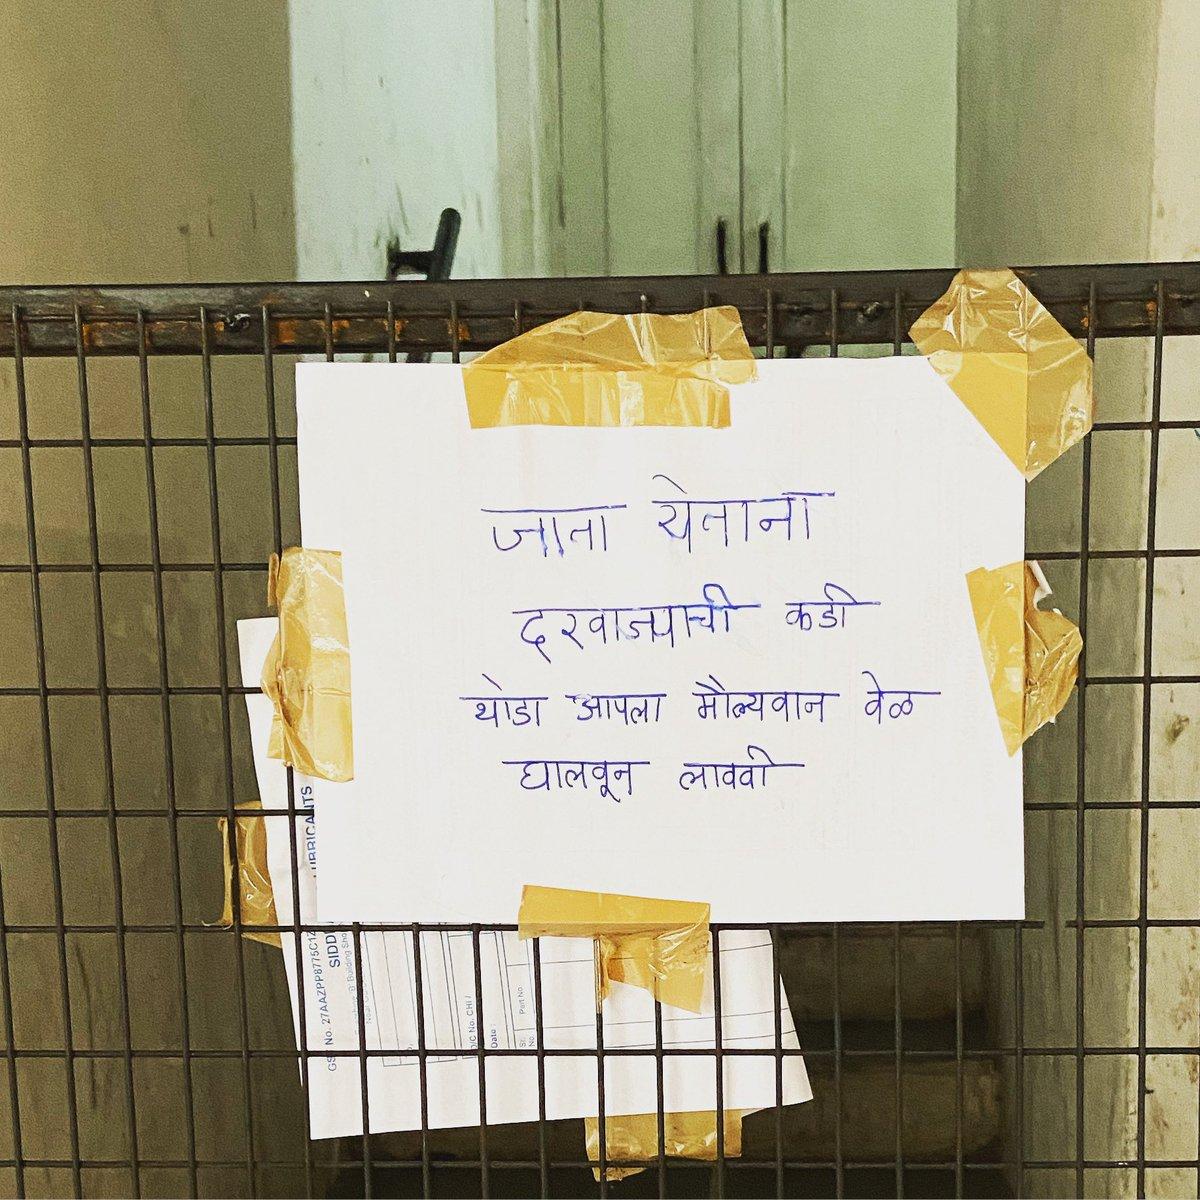 Note please! 😆😆 #pune #puneripatya https://t.co/7mUOkWCfuS